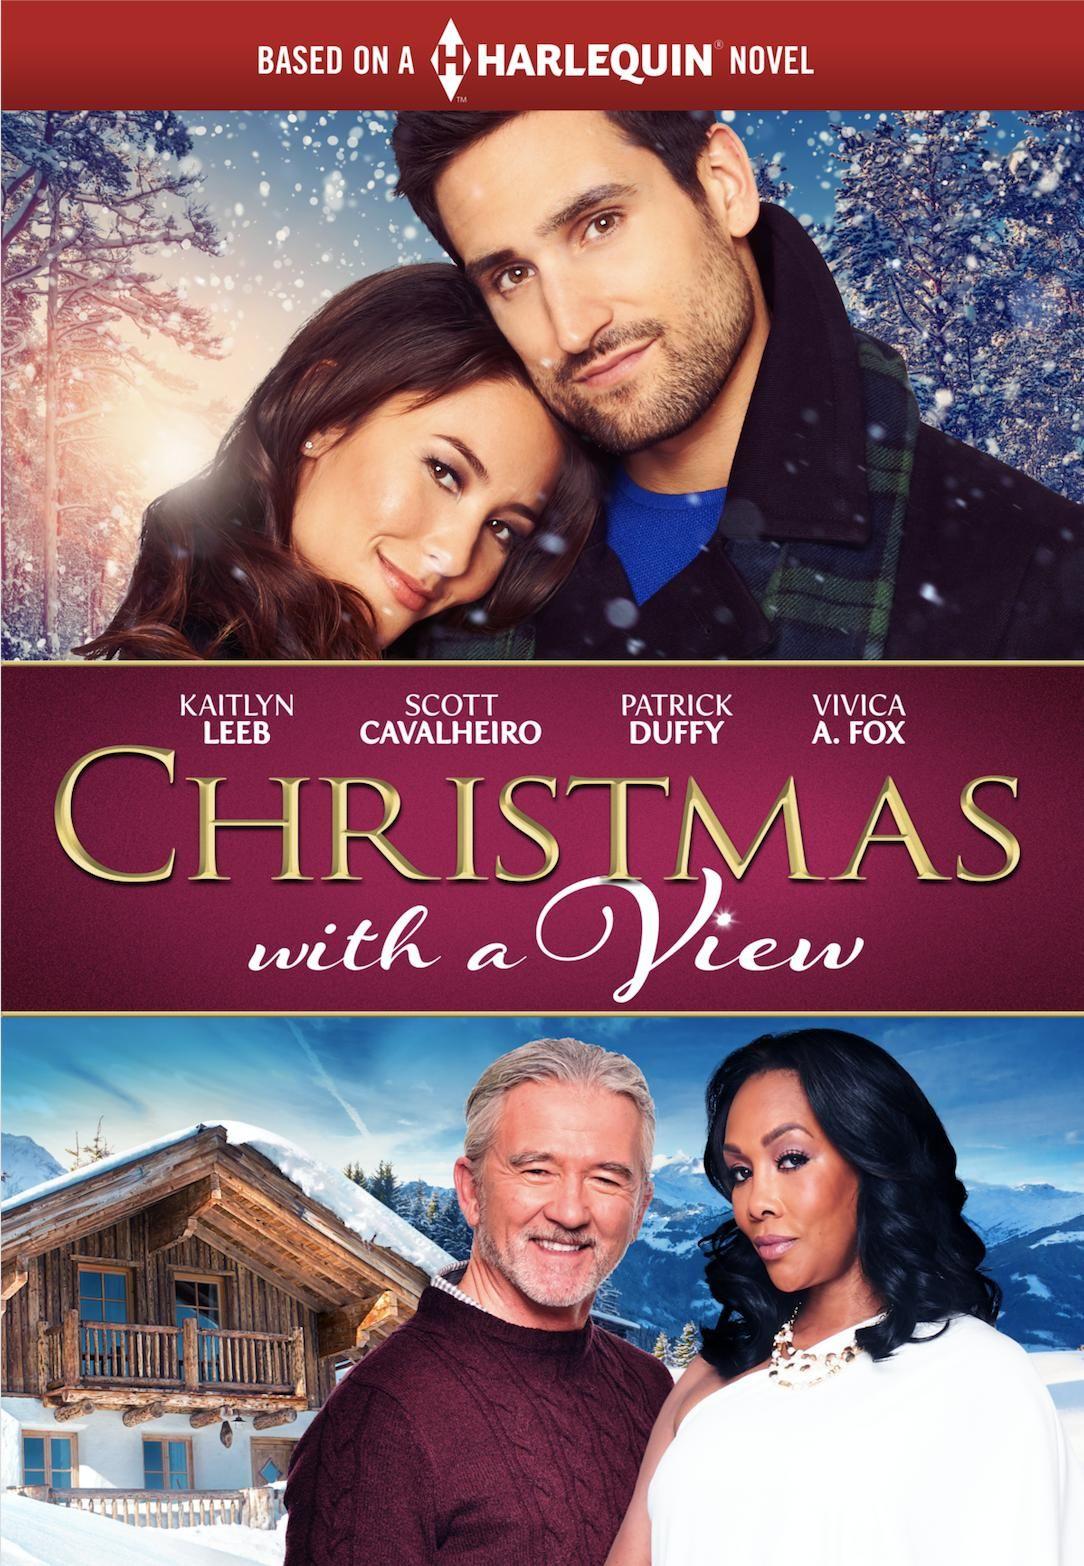 30+ Best Christmas Movies on Netflix - Good Holiday Movies on Netflix